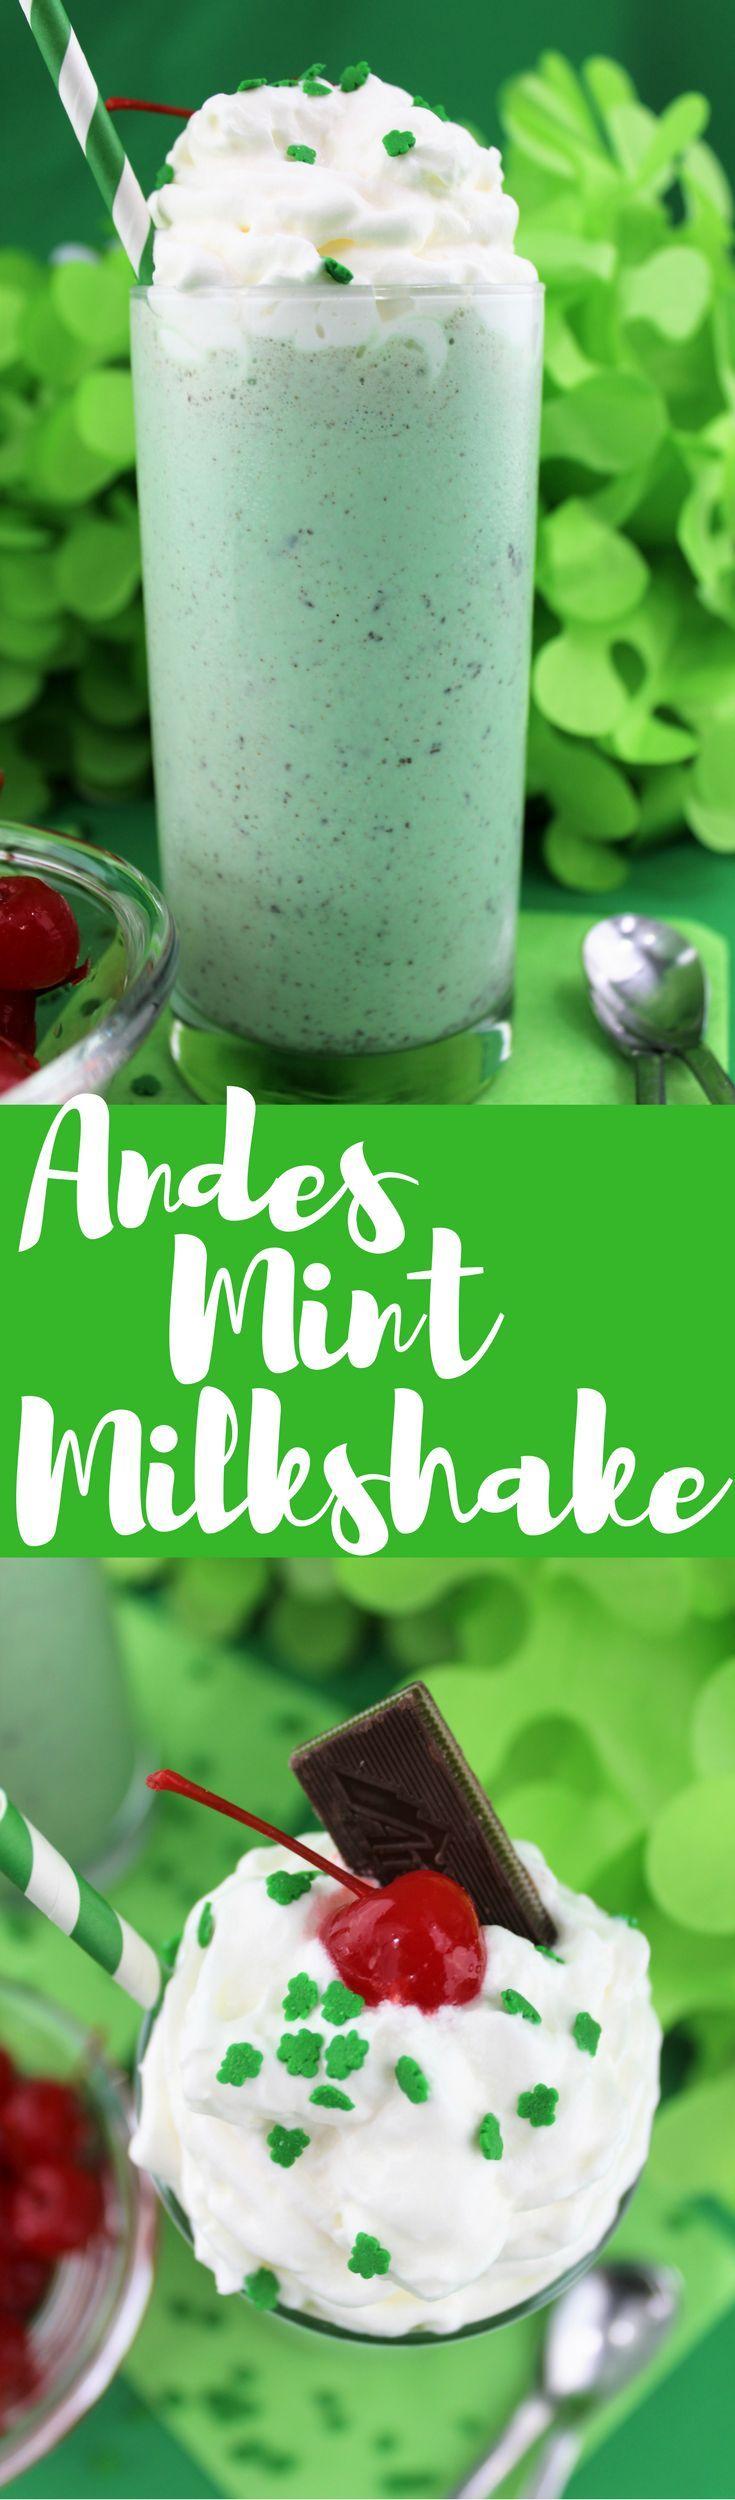 Andes Mint Milkshake | St Patrick's Day | Milkshake | Mint | Holiday | Dessert